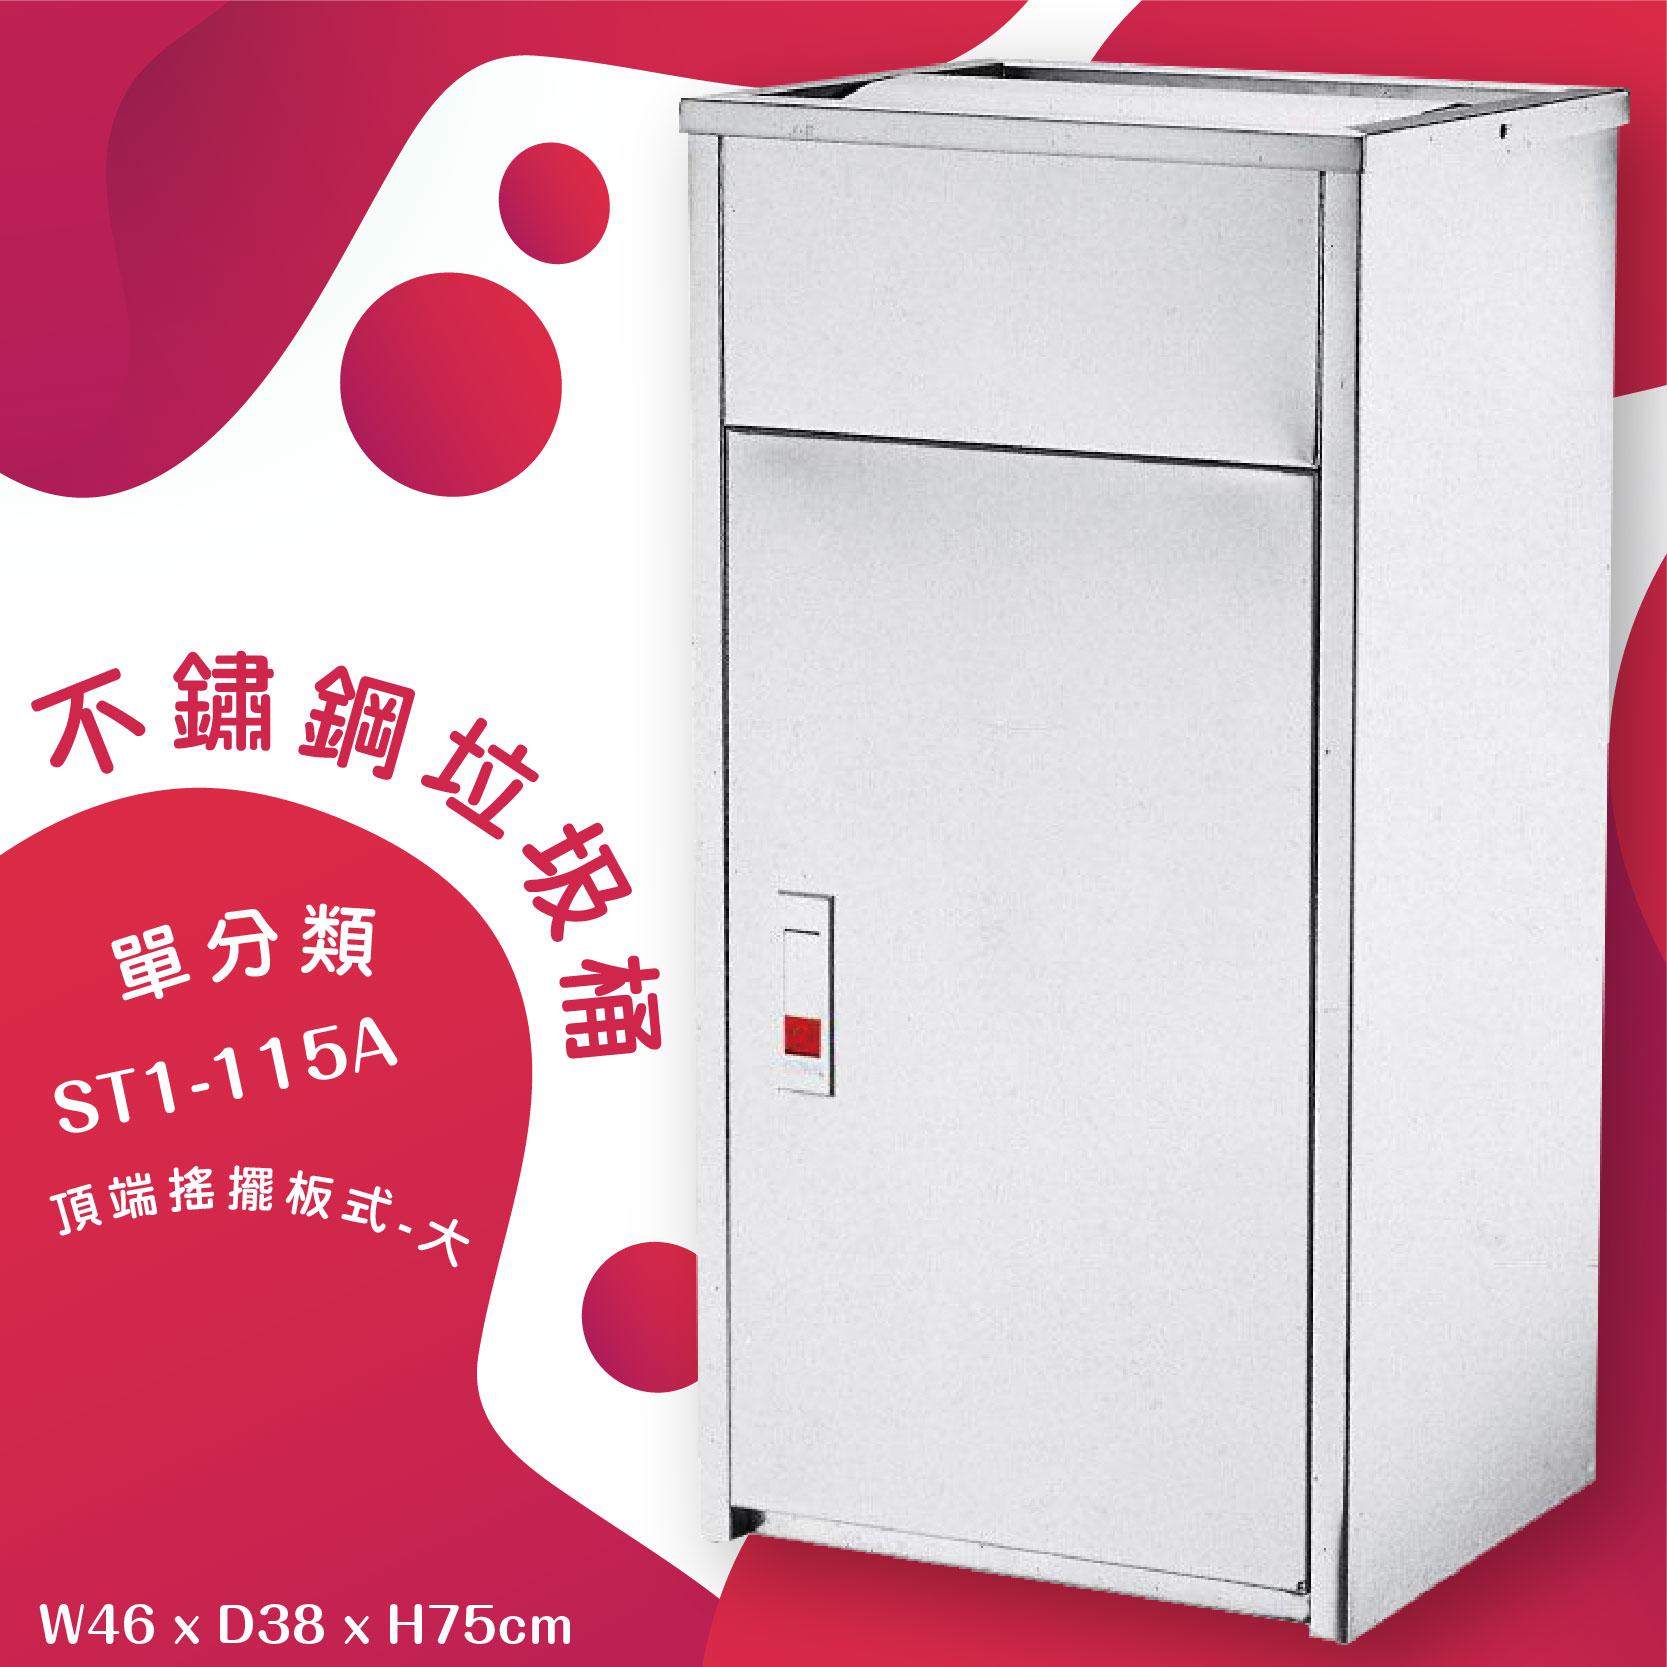 ST1-115A 不鏽鋼清潔箱(大) 頂端搖擺板式 附不鏽鋼內桶 垃圾桶 不鏽鋼垃圾桶 回收桶 資源回收 公共設施